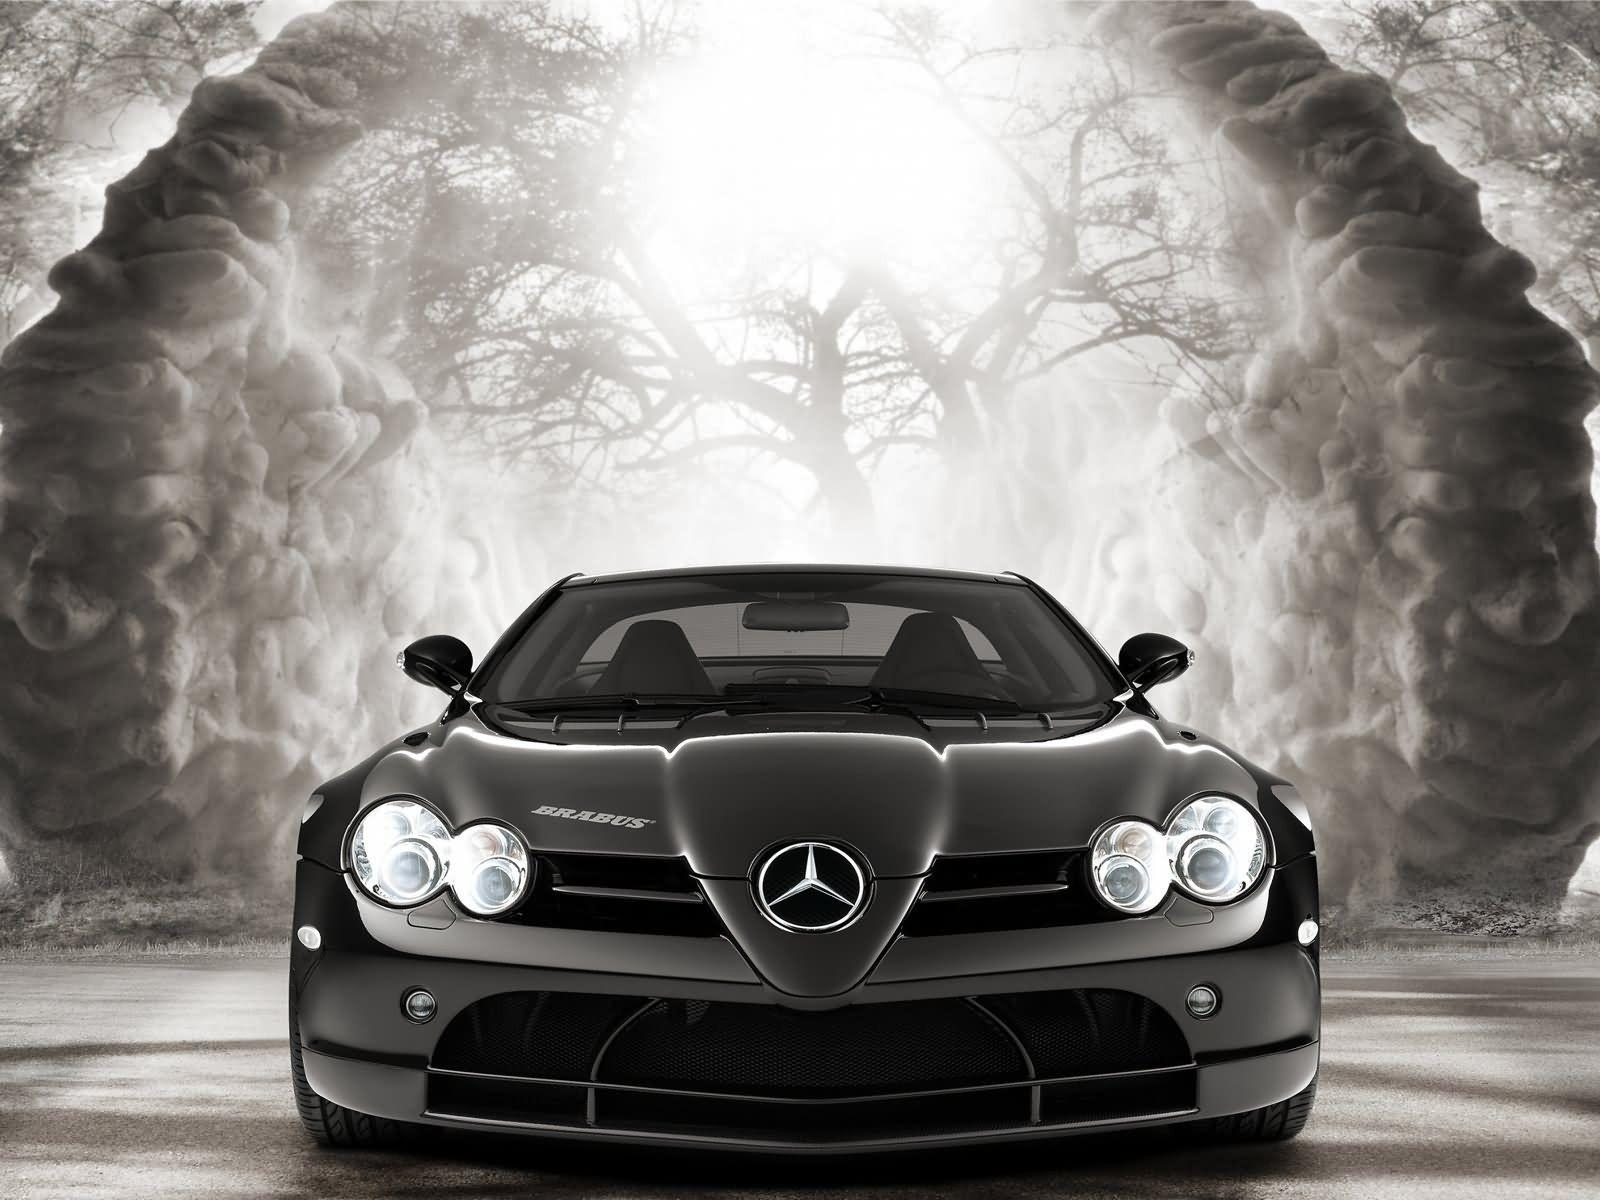 Mercedes Benz Slr Mclaren Wallpapers Wallpaper Cave